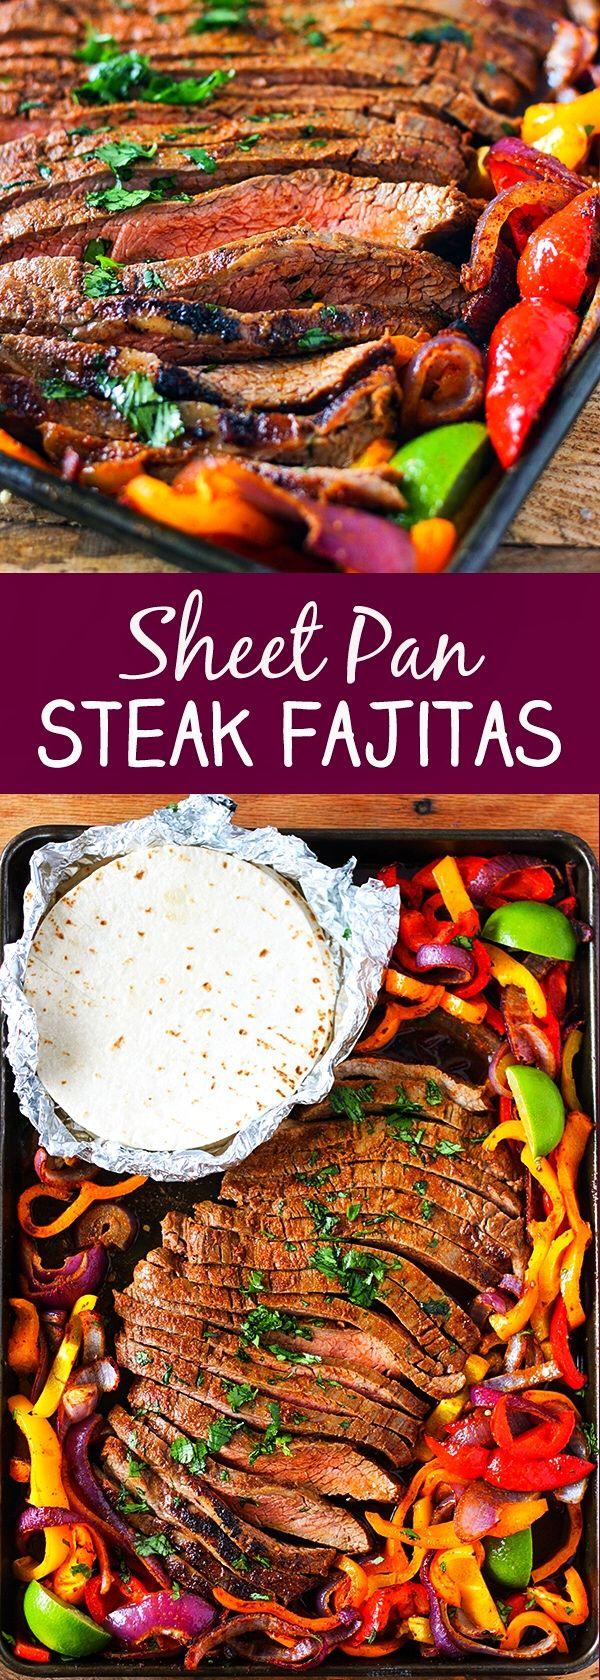 Sheet Pan Steak Fajitas #steakfajitarecipe